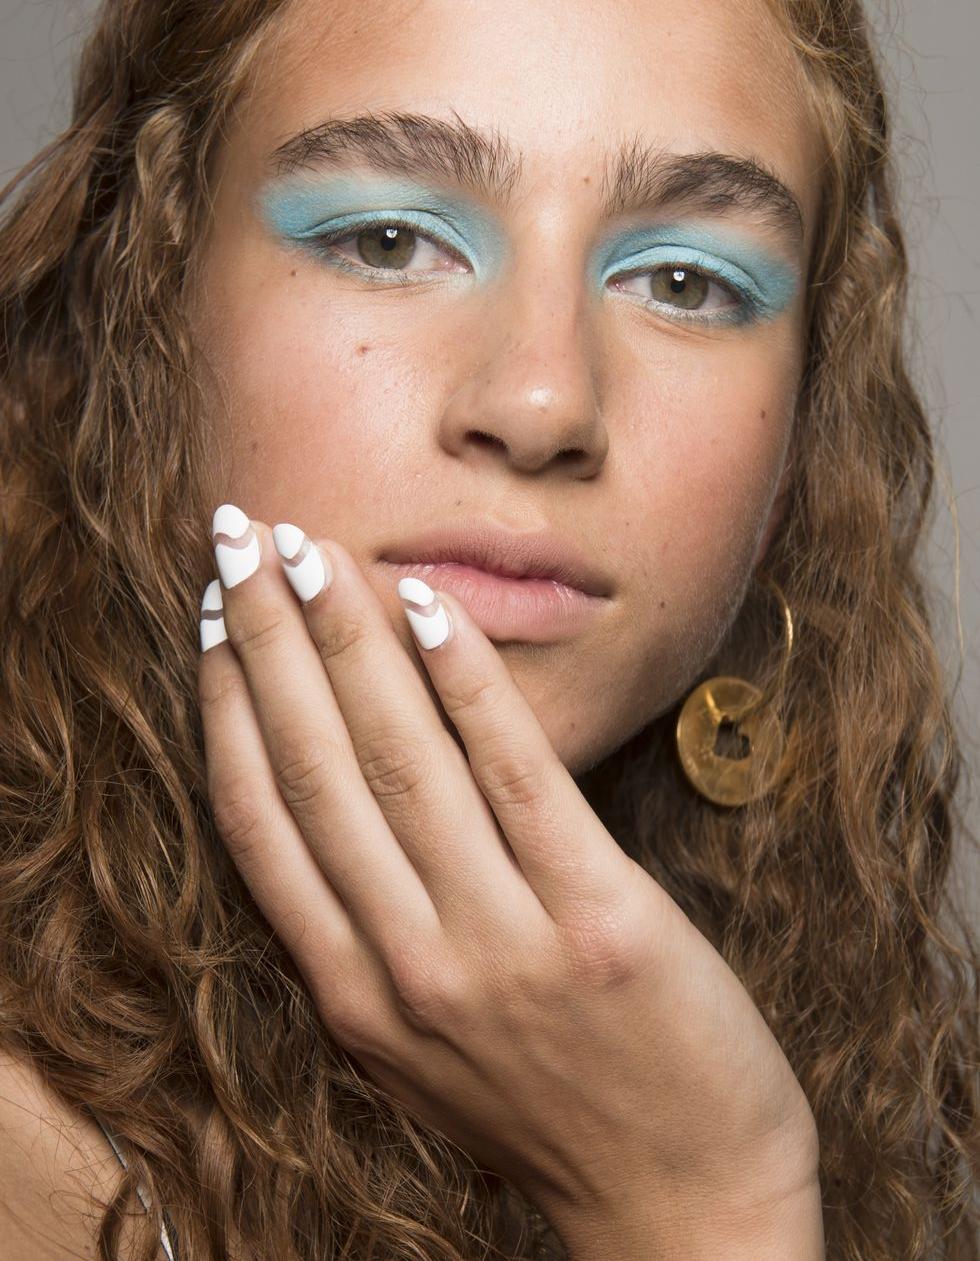 spring-summer-2018-hair-makeup-trends-house-of-holland-bks-v-rs18-1200-1506691499.jpg